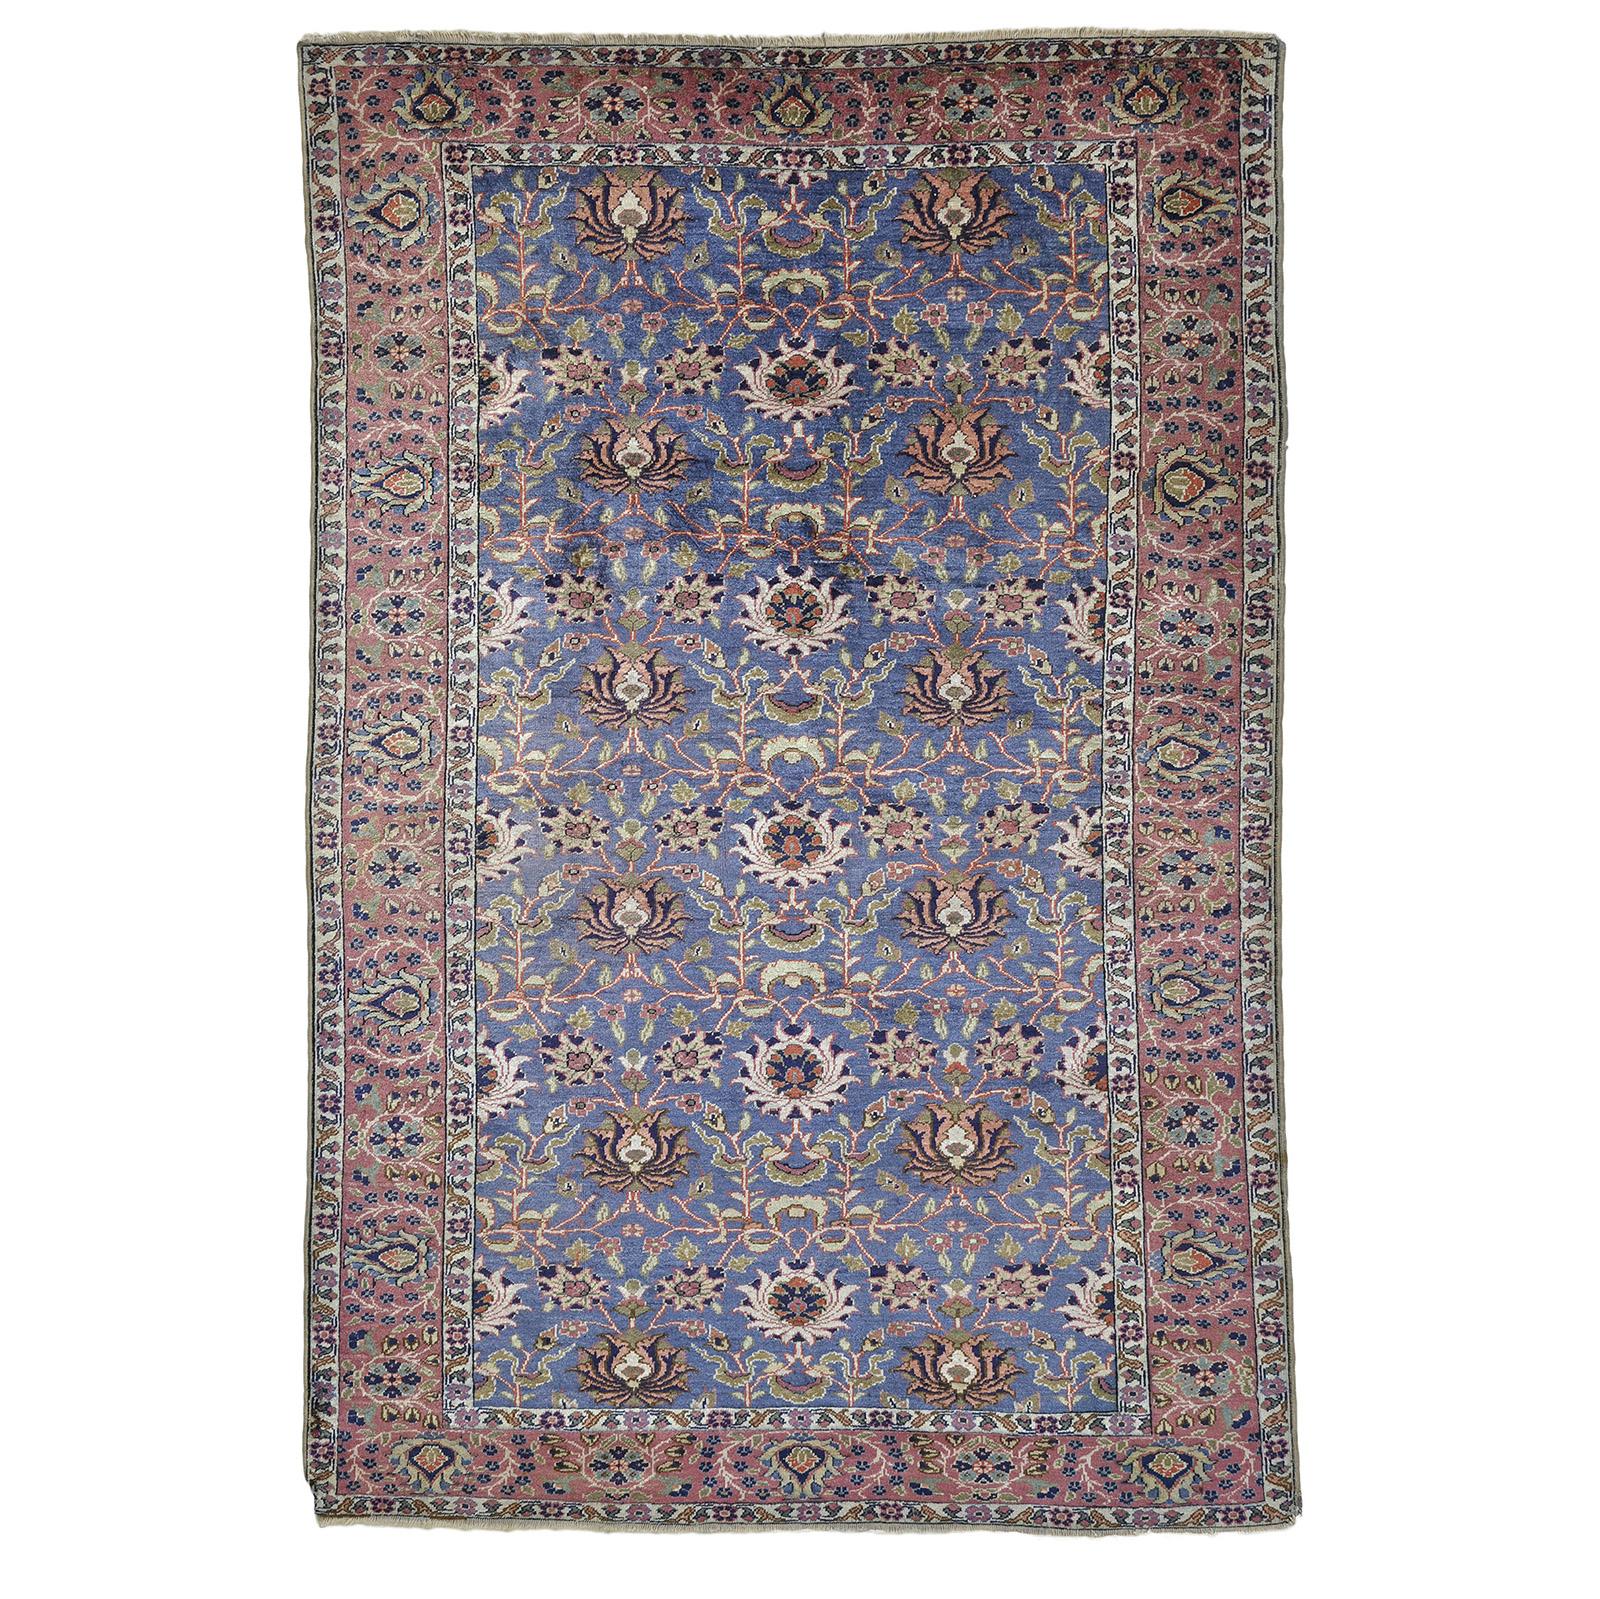 Kayseri silke (Semi Antik) matta storlek 173x118 cm